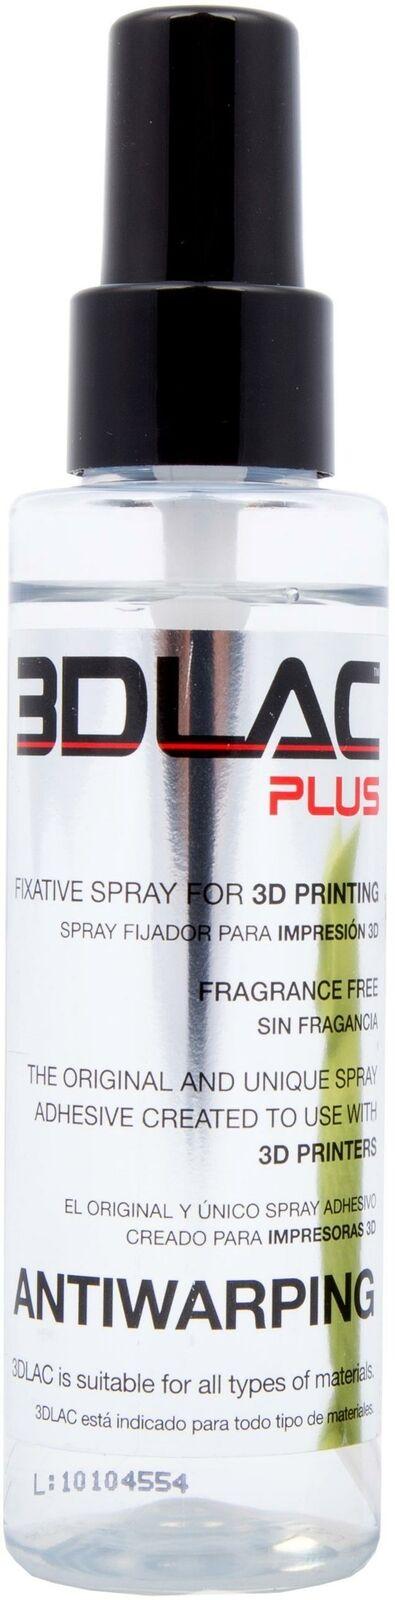 3DLAC Plus 3D Printer Adhesive, Antiwarping spray, Help Your 3D Prints To Stick